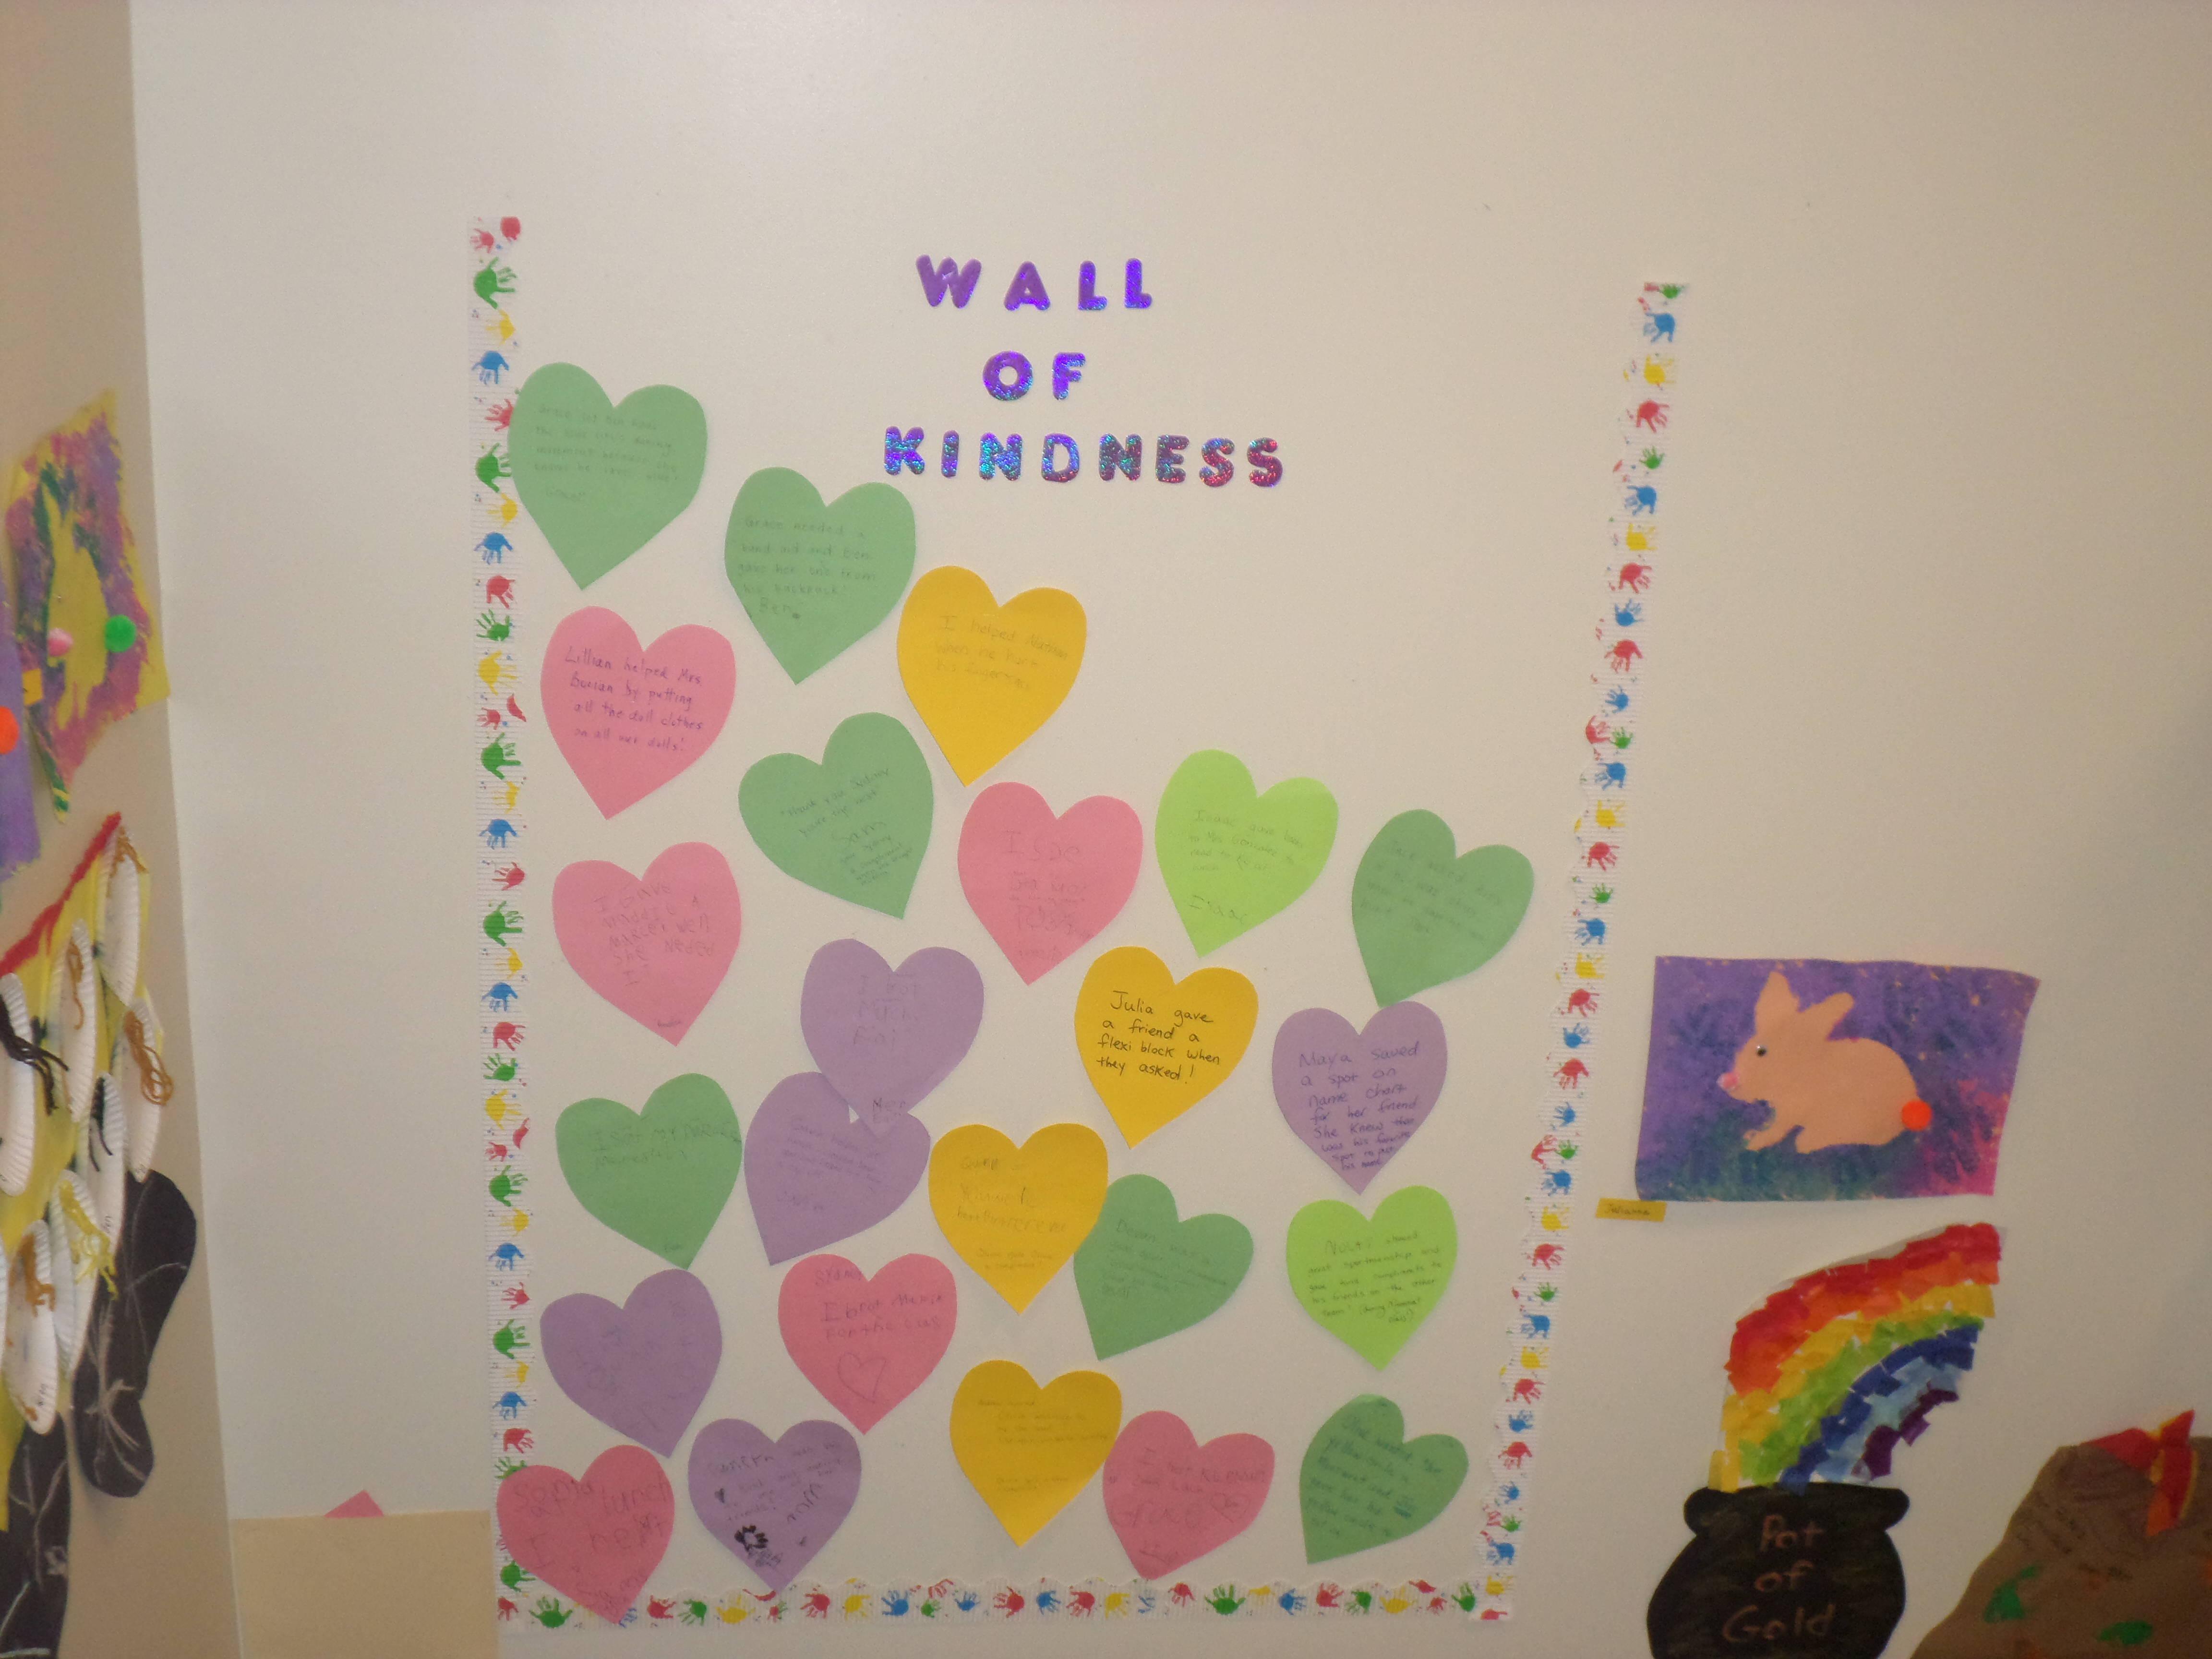 8ade9425a64e6893f17f_Wall_of_Kindness_001.JPG